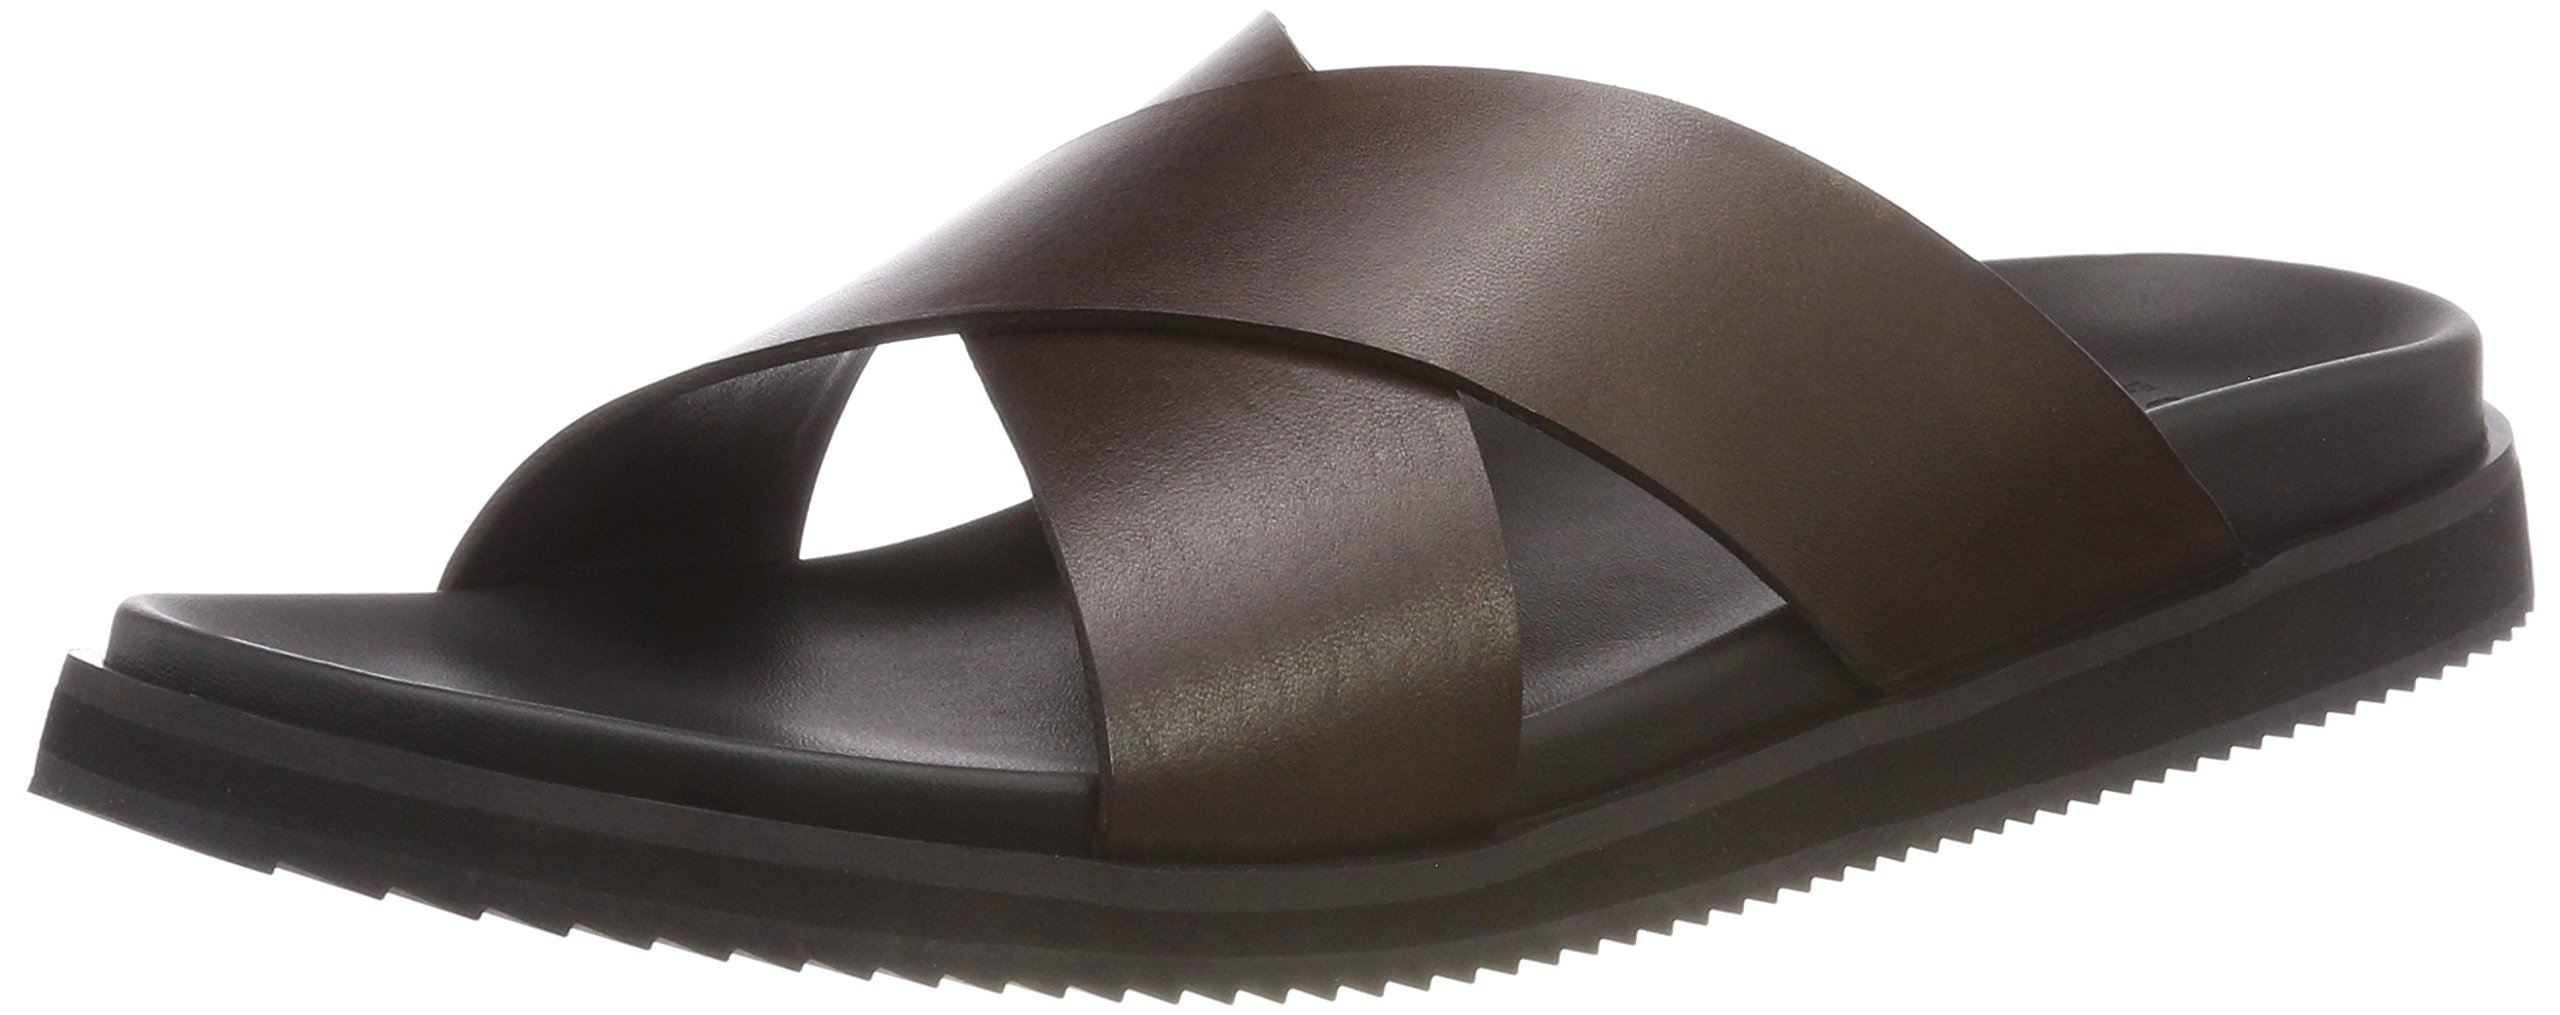 Bertie Eu IdiomTongs leather43 HommeMarron Brown 6gImyfYb7v